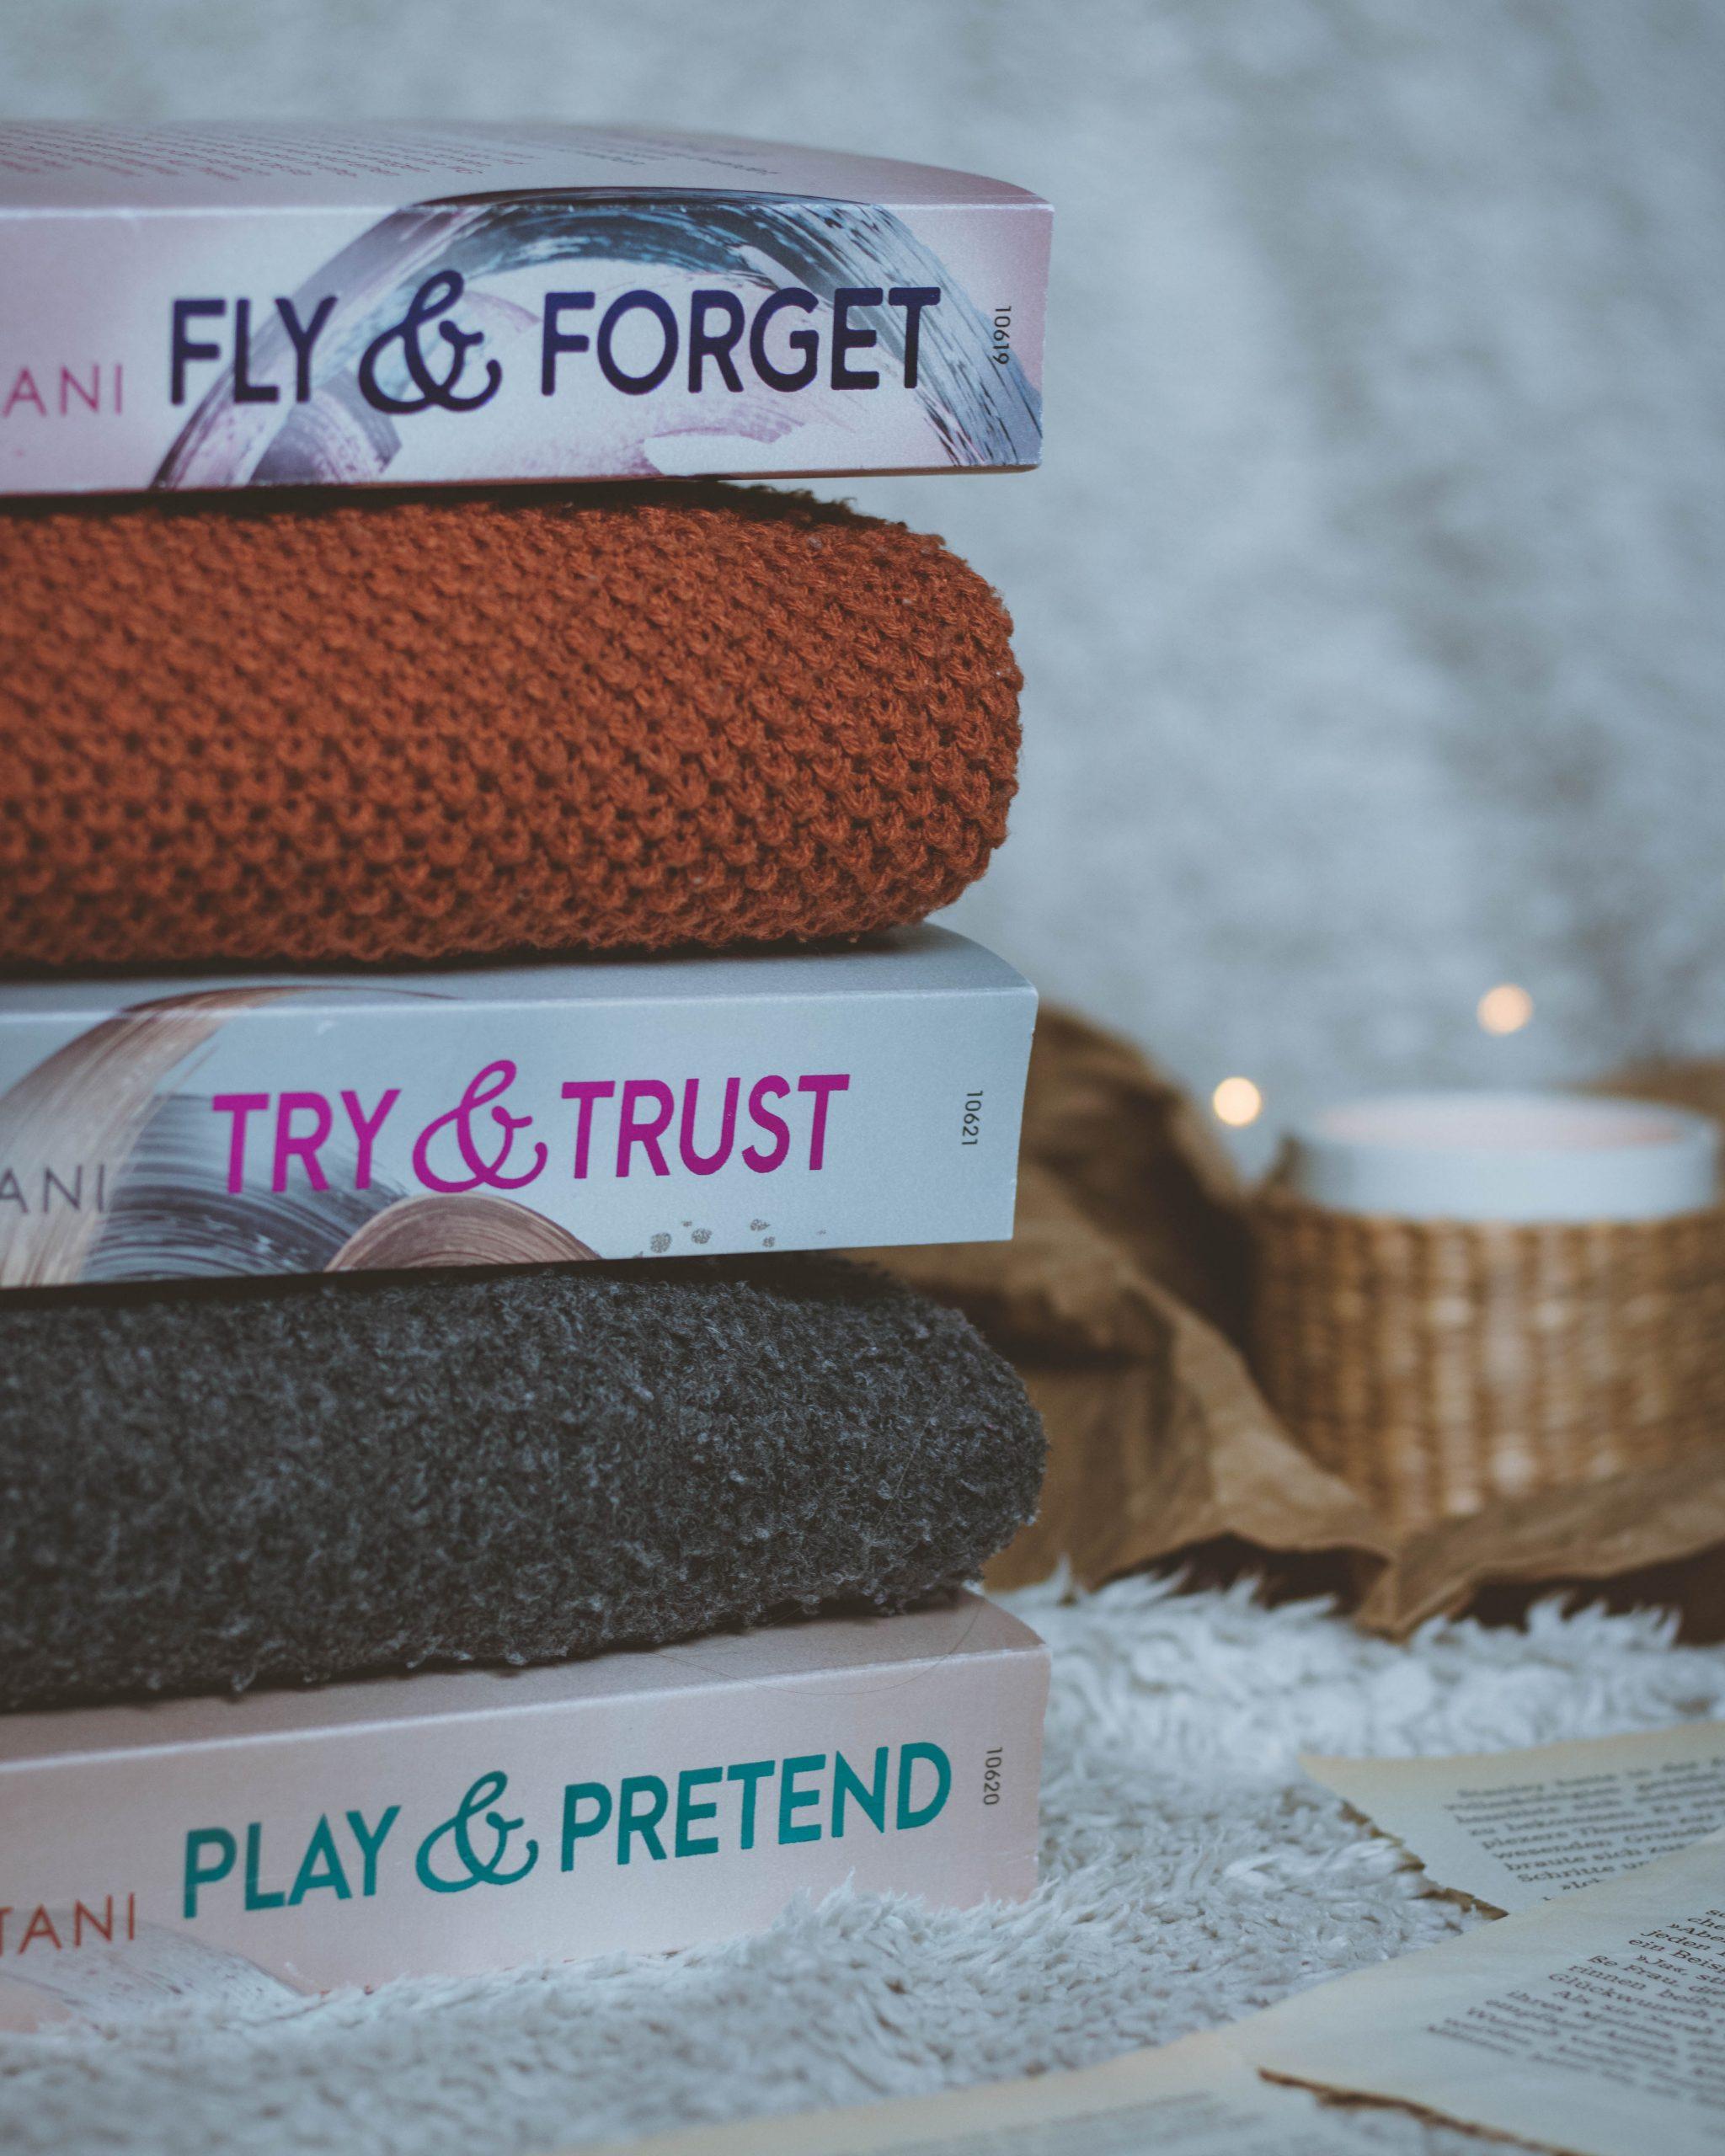 Play & Pretend – Soho Love #3 | Nena Tramountani